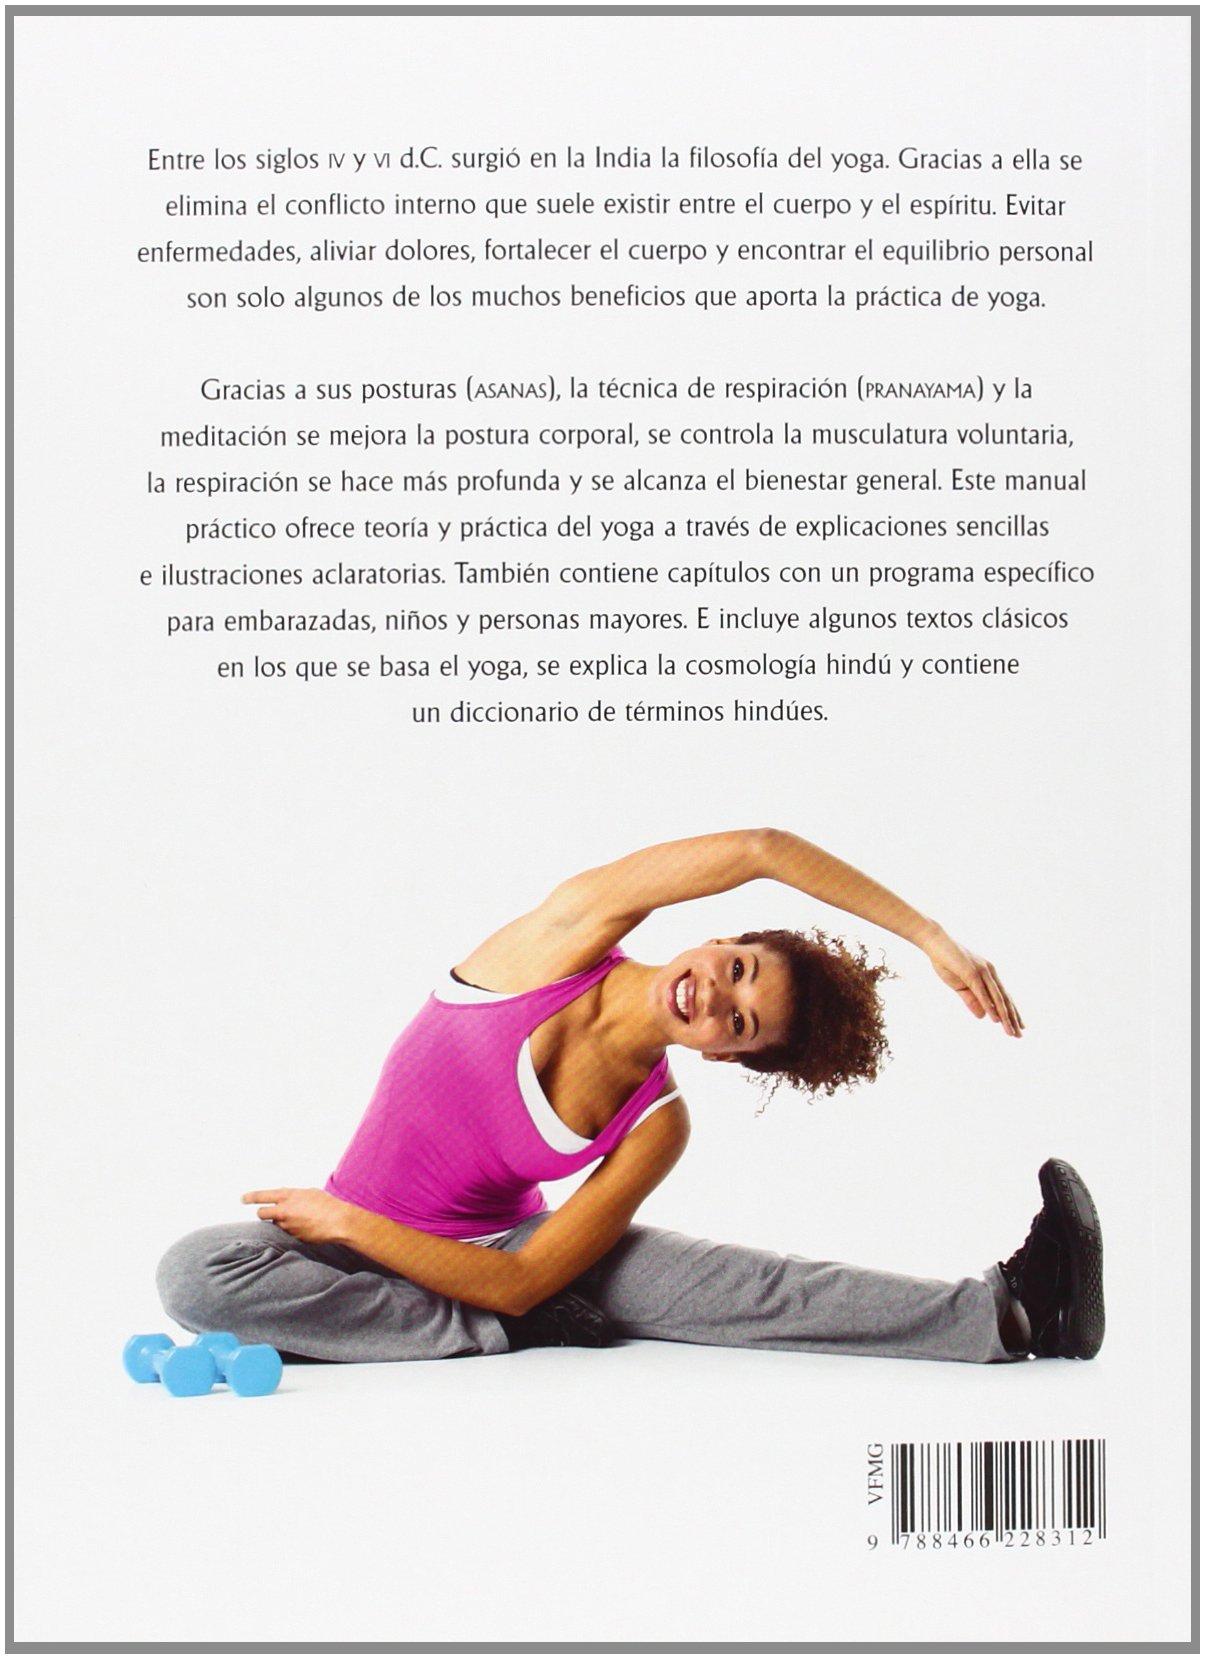 Yoga Fácil (Poderes Ocultos): Amazon.es: Francesca Chiapponi ...